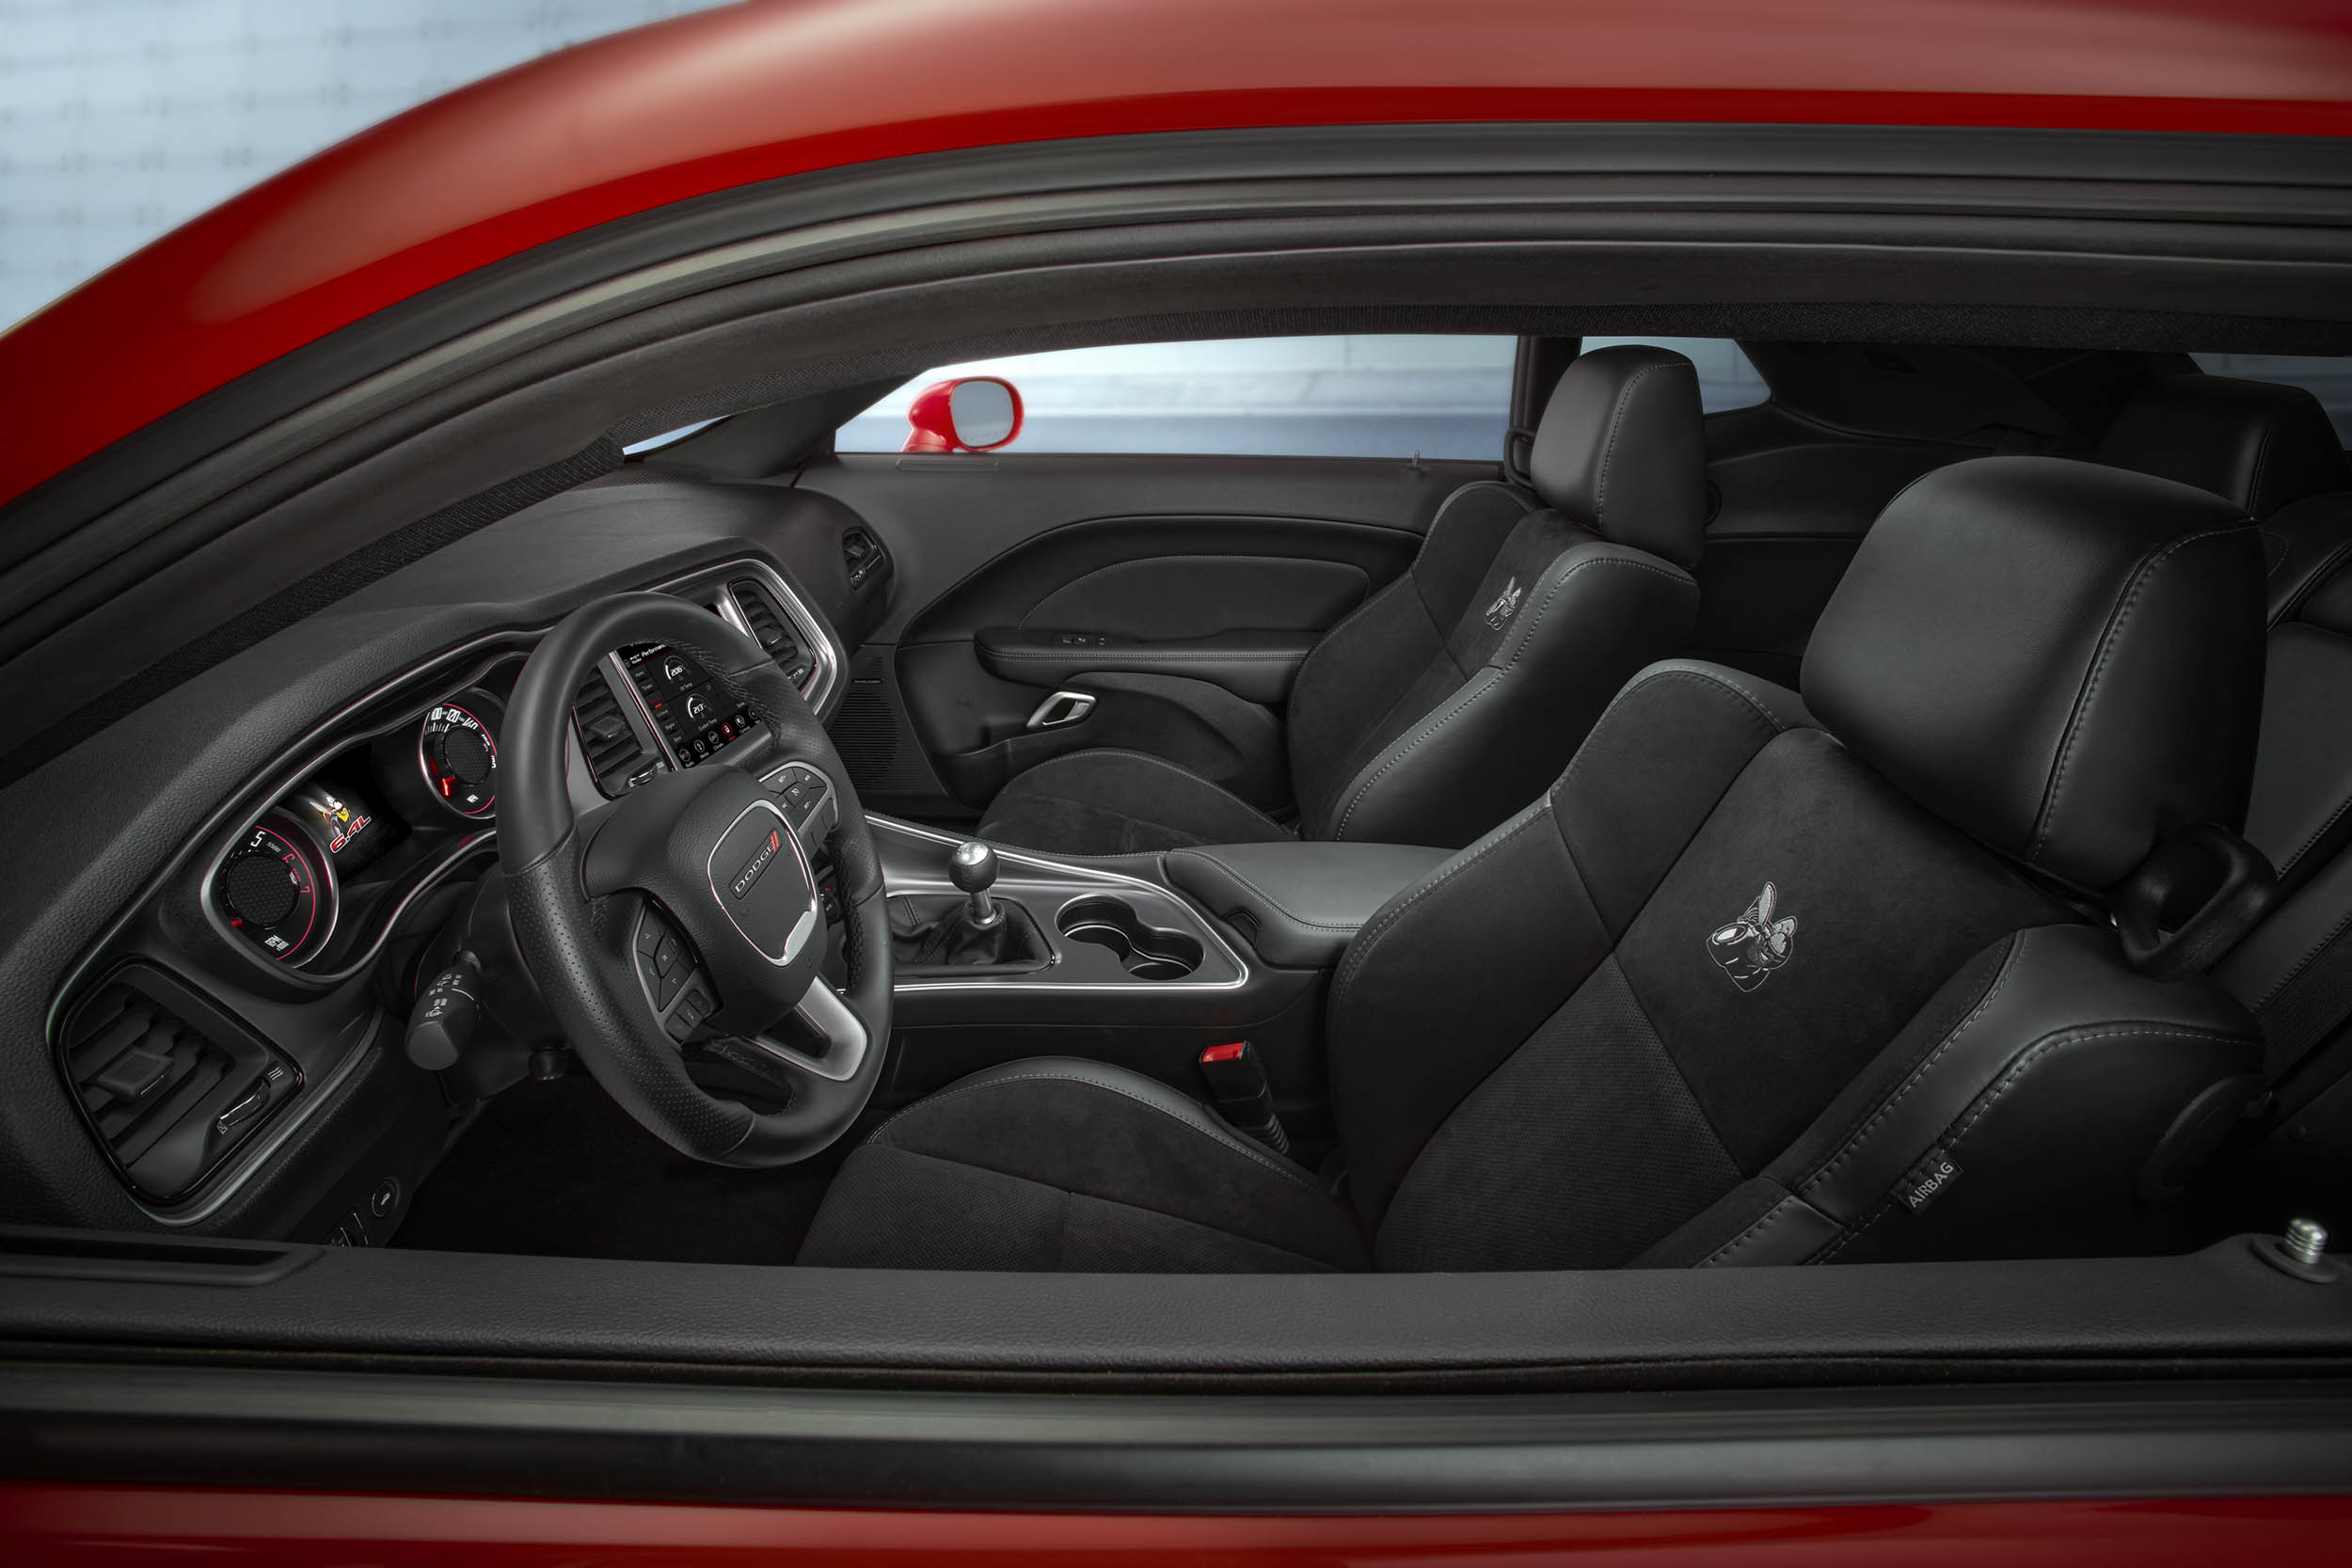 2019 Dodge Challenger R/T Scat Pack Widebody interior